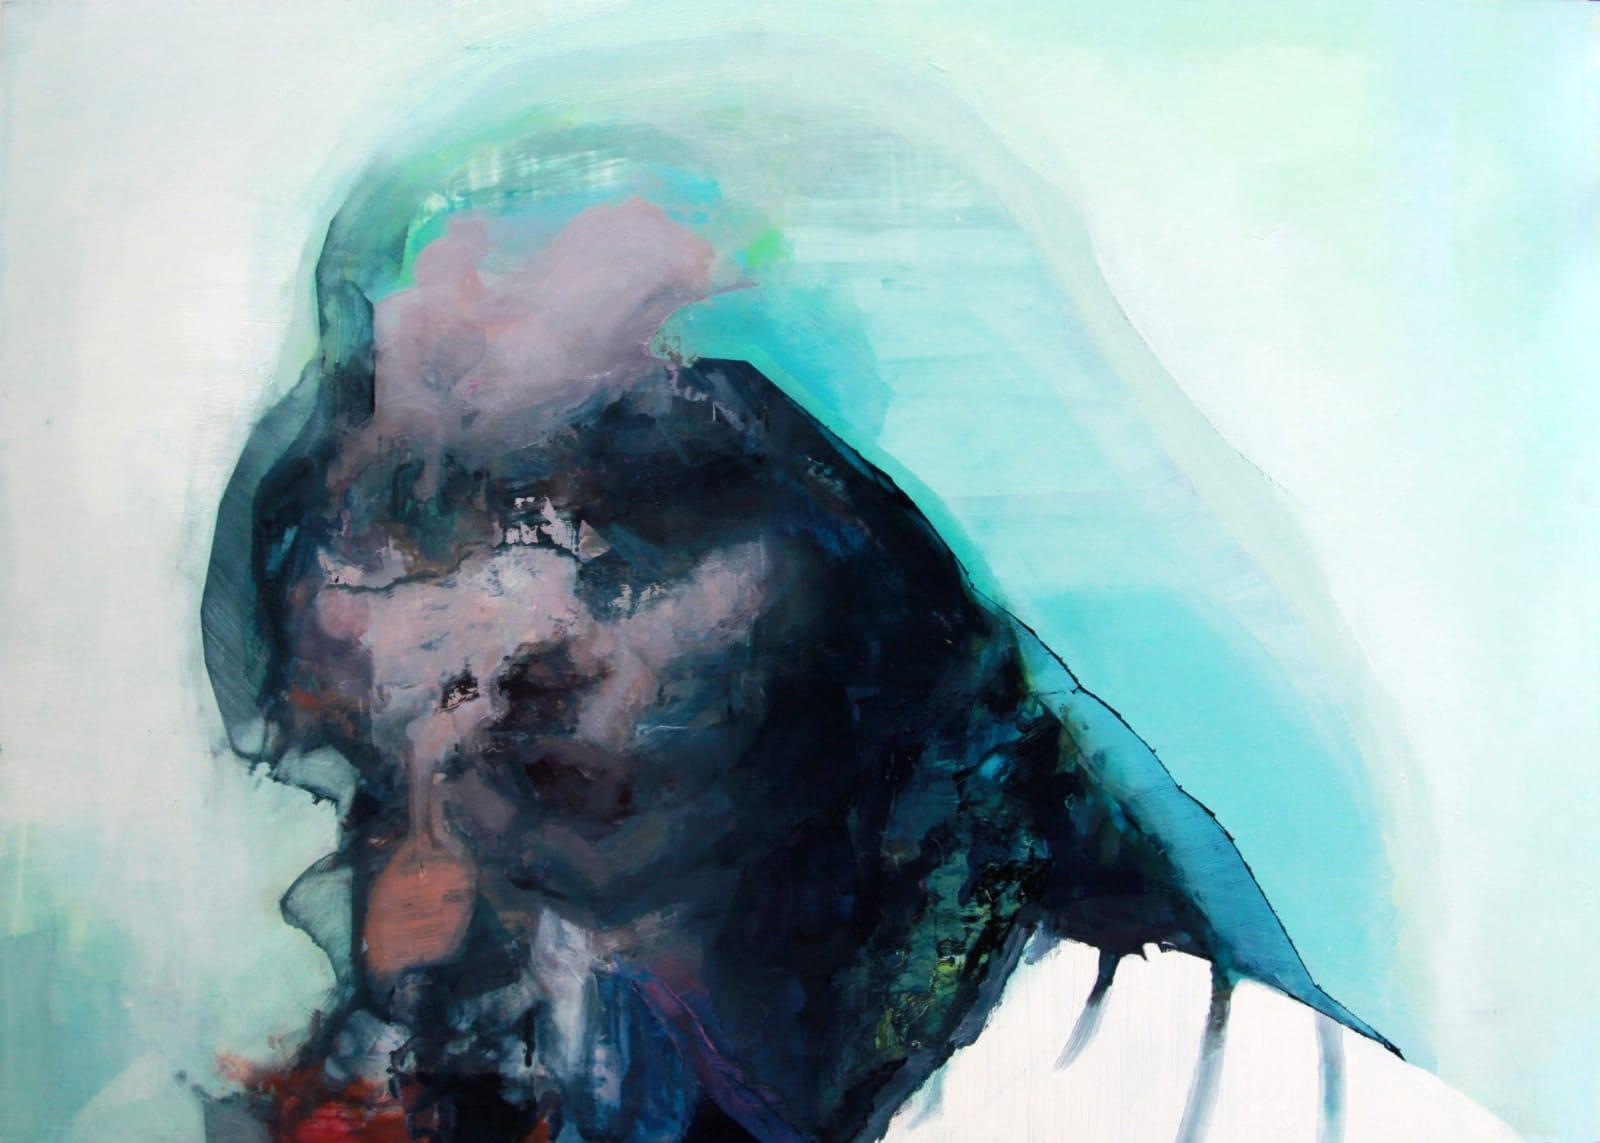 Cian McLoughlin Tronie - Woman leaning forward Oil on canvas 20 x 28 inches